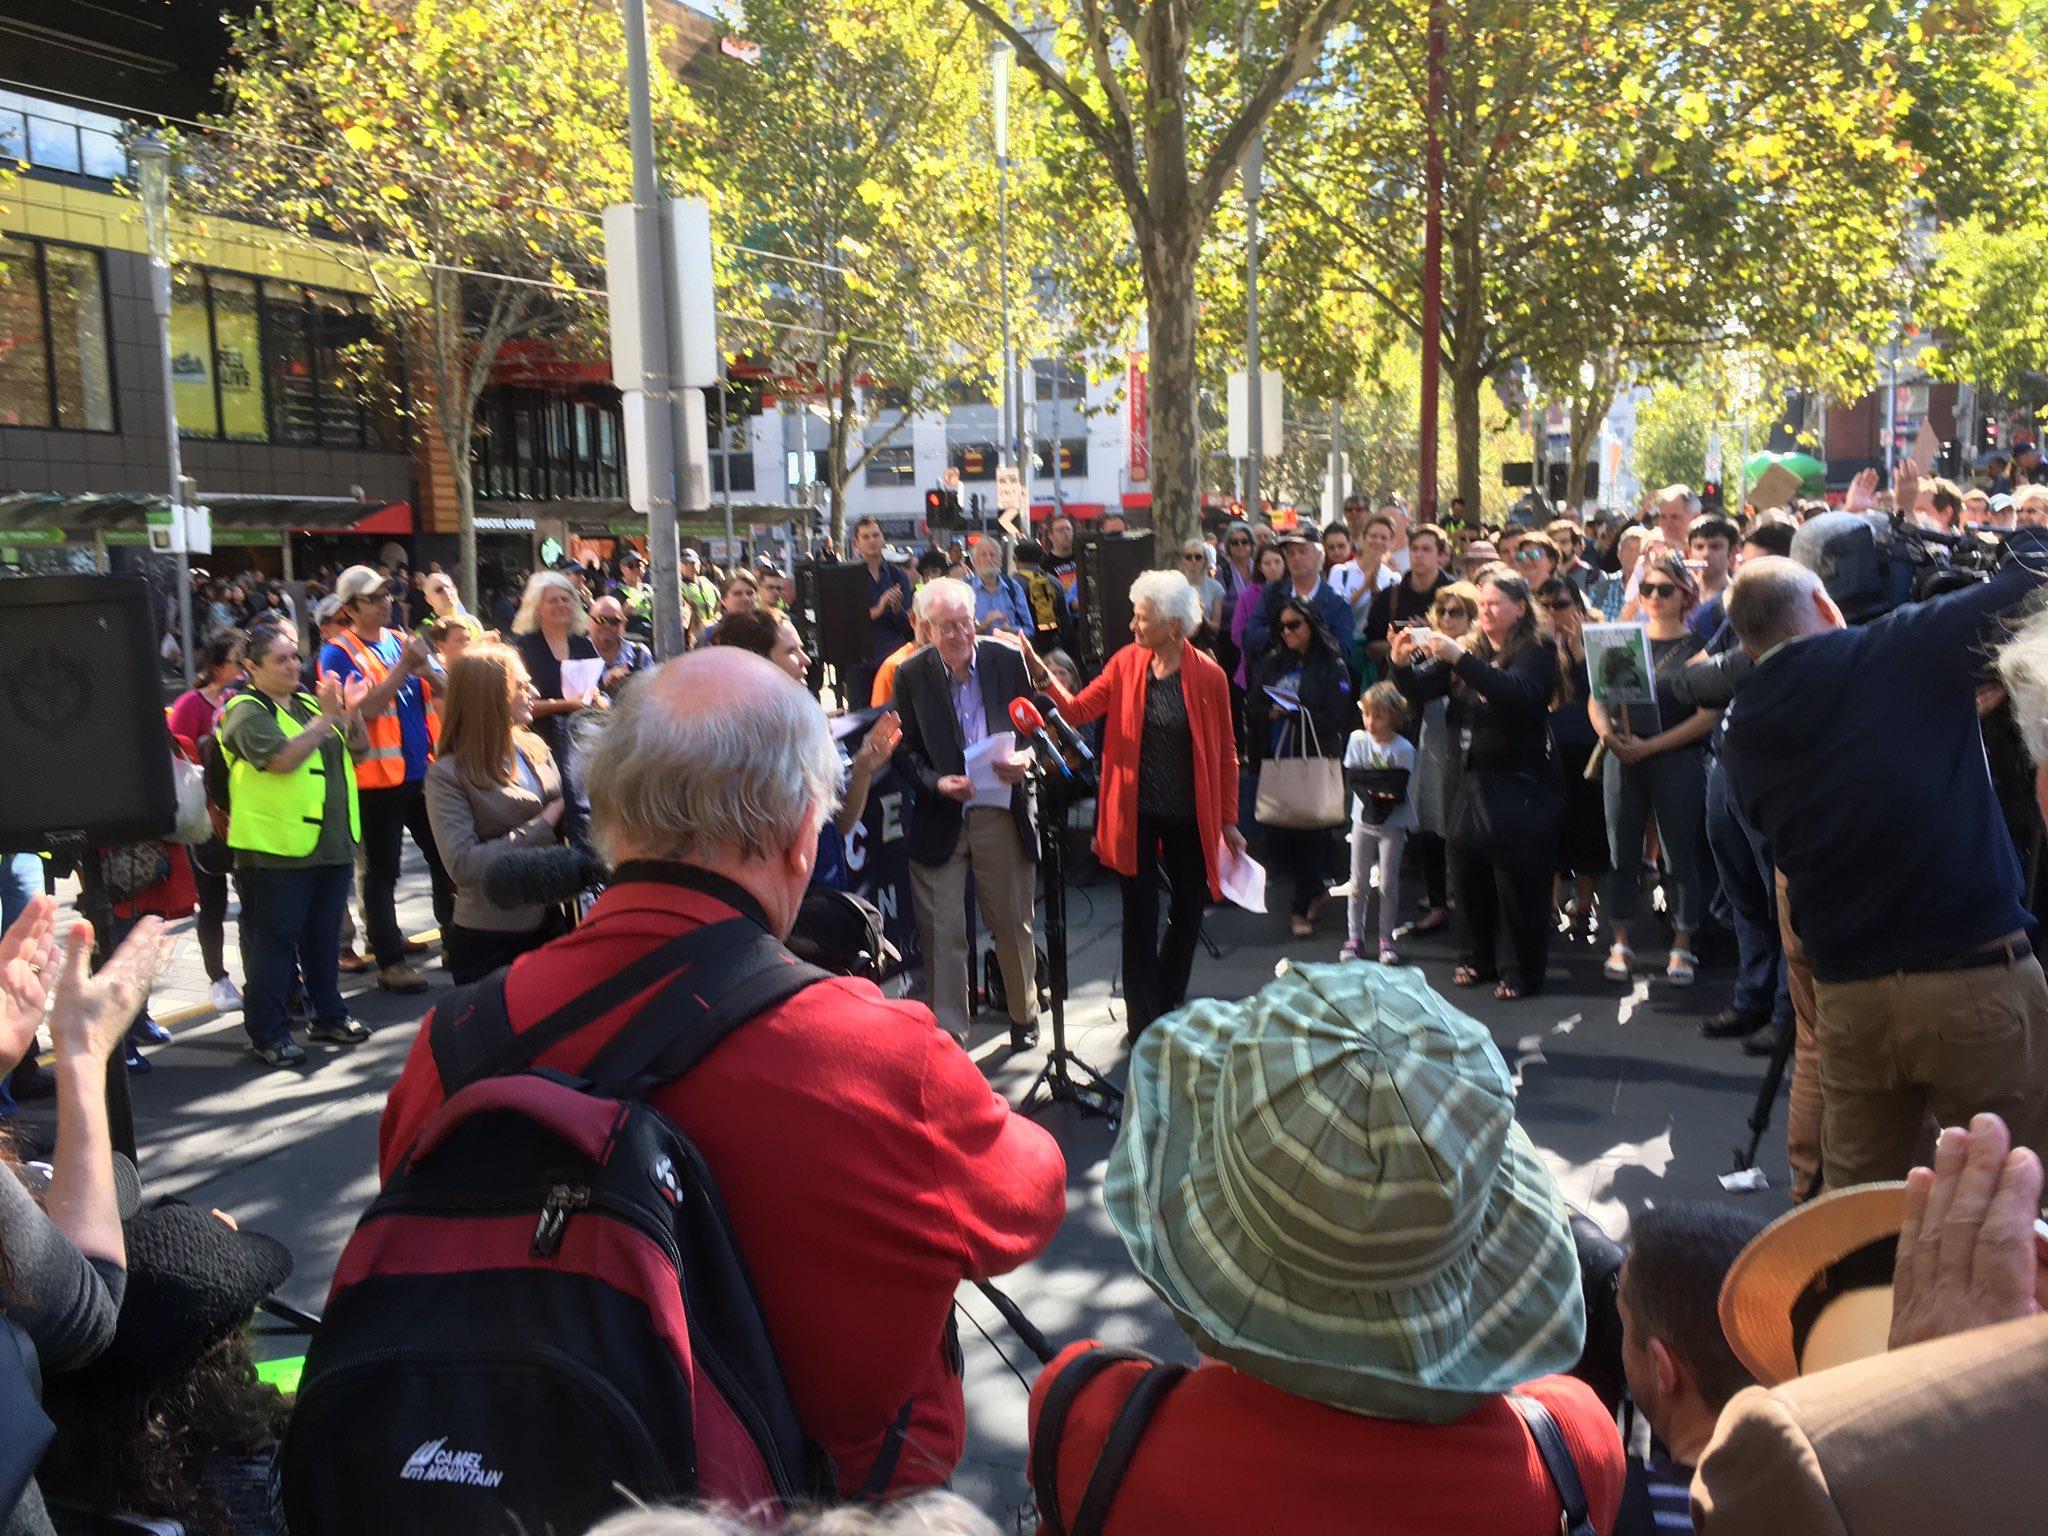 #marchforscience #Melbourne #Australia  @ProfPCDoherty and Fiona Stanley 😀 https://t.co/U5NyIUQFYR